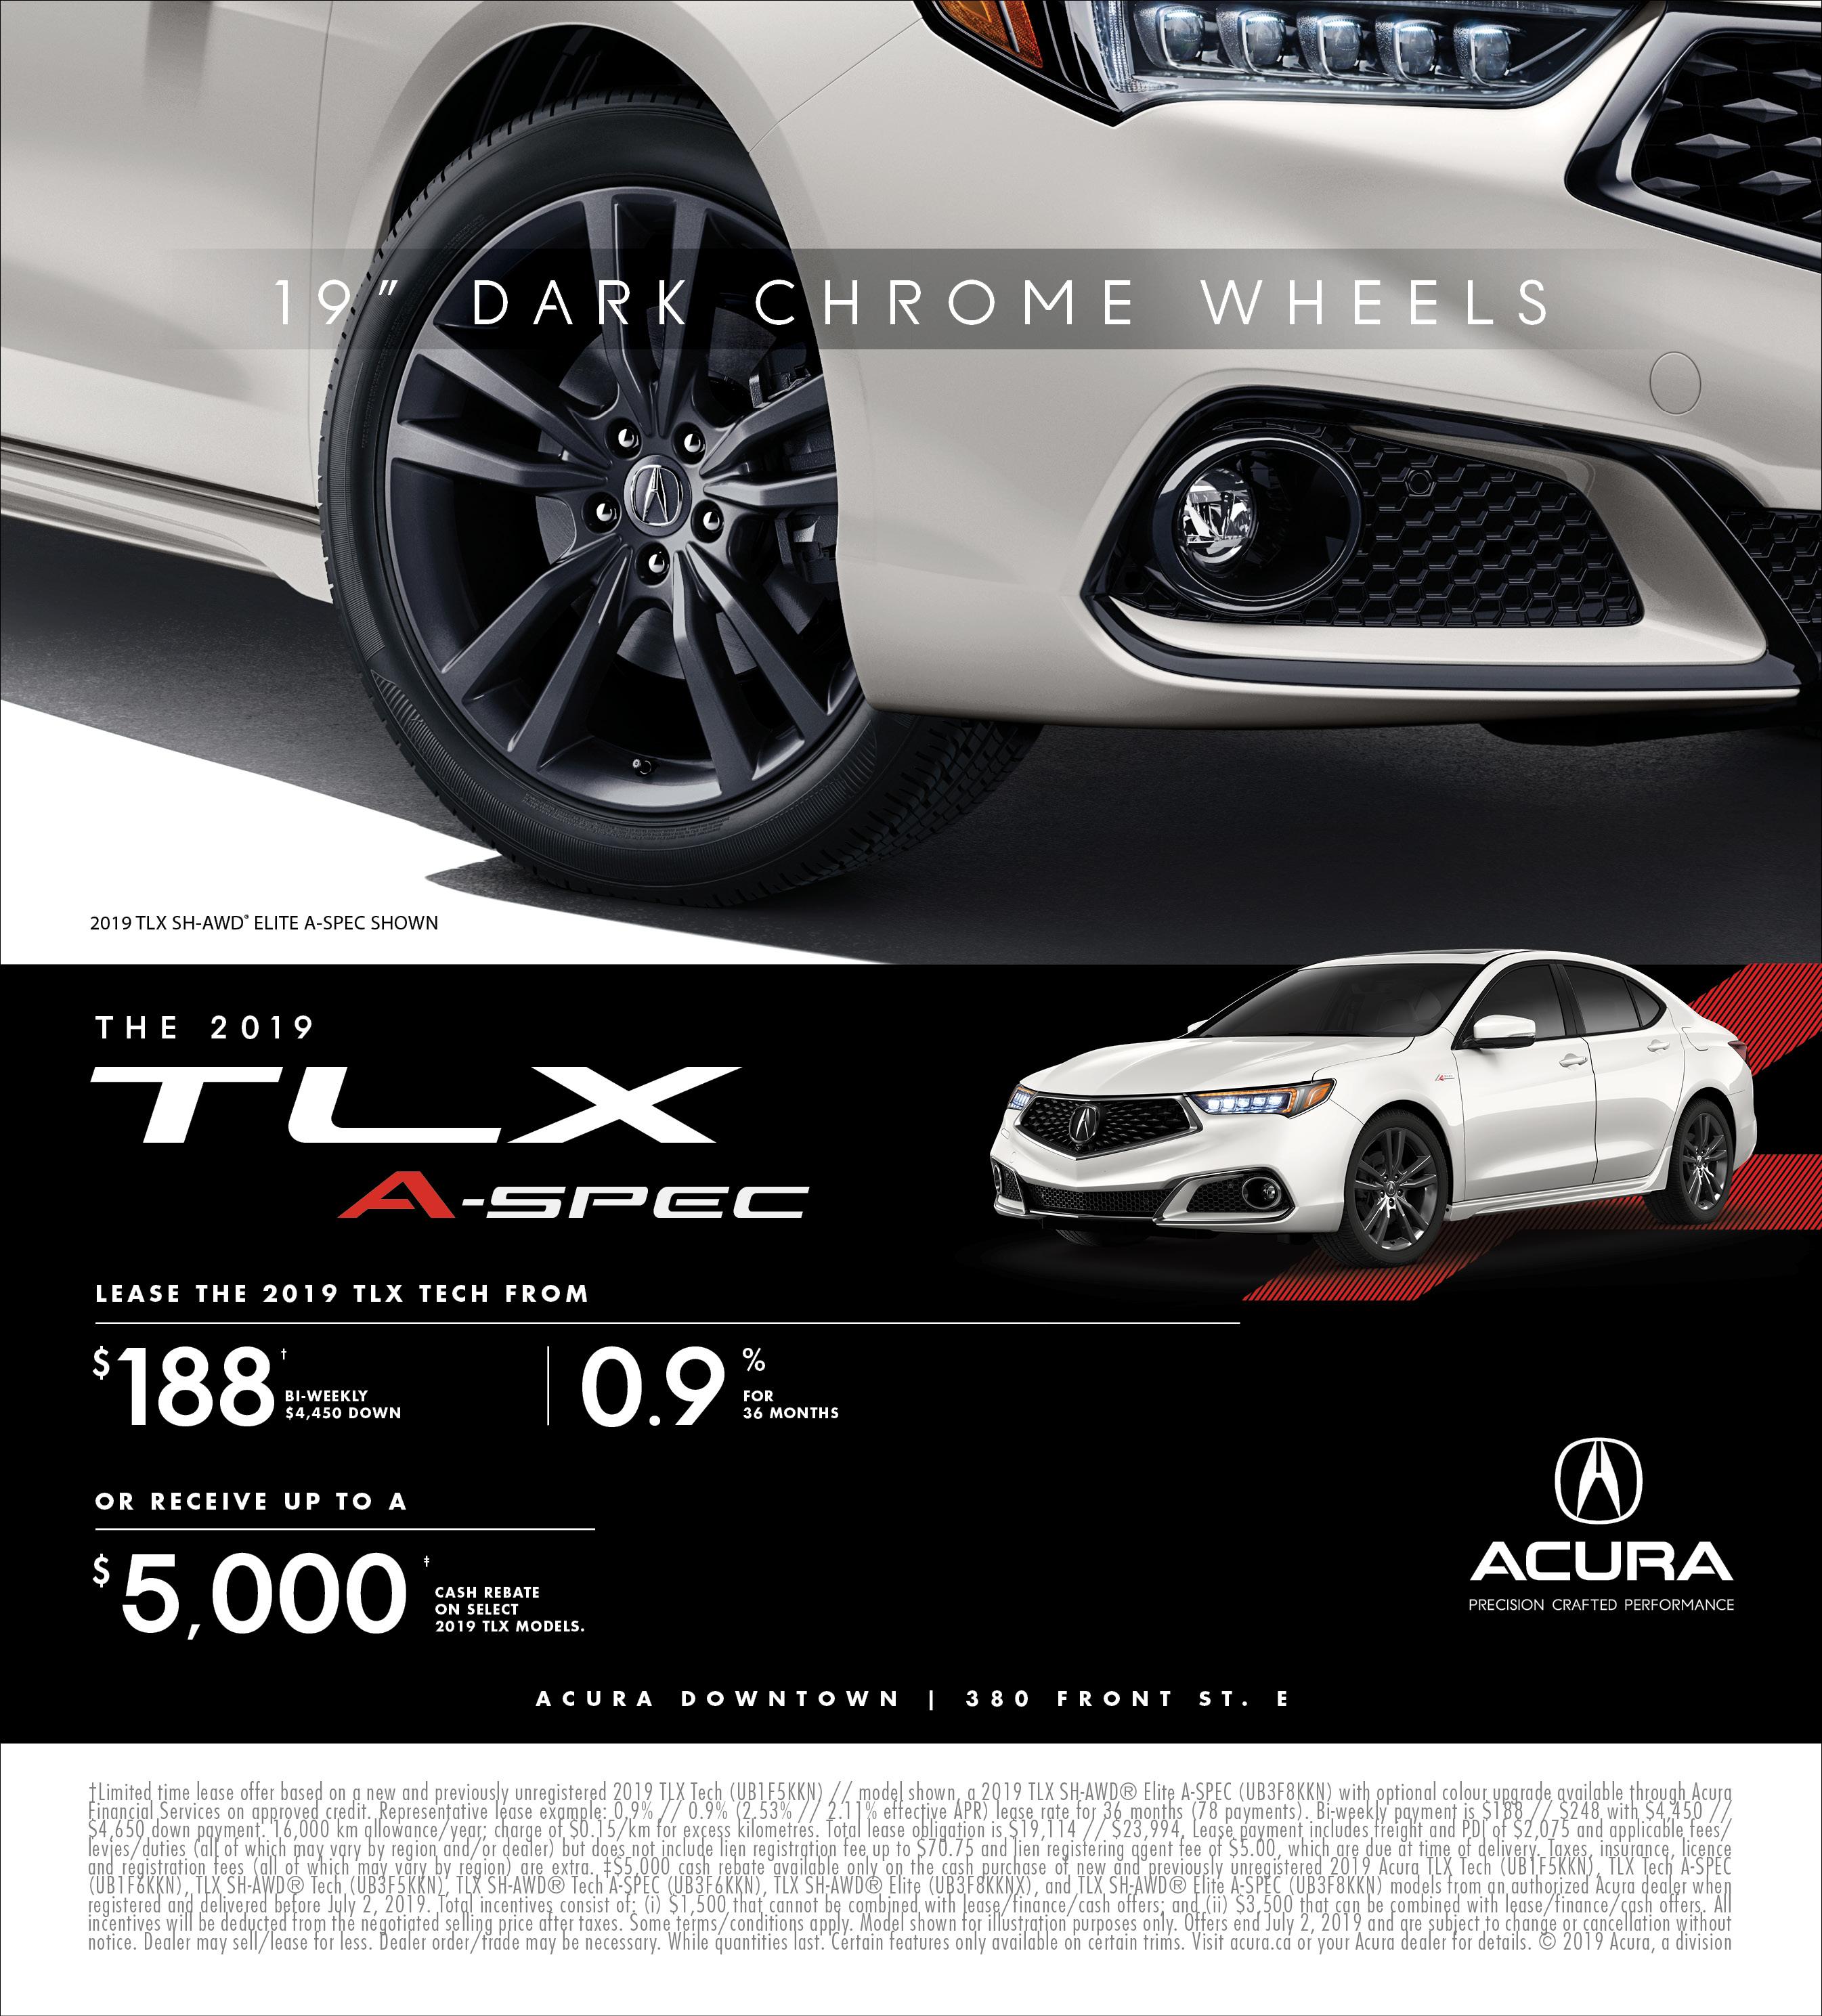 2019 Acura TLX   June